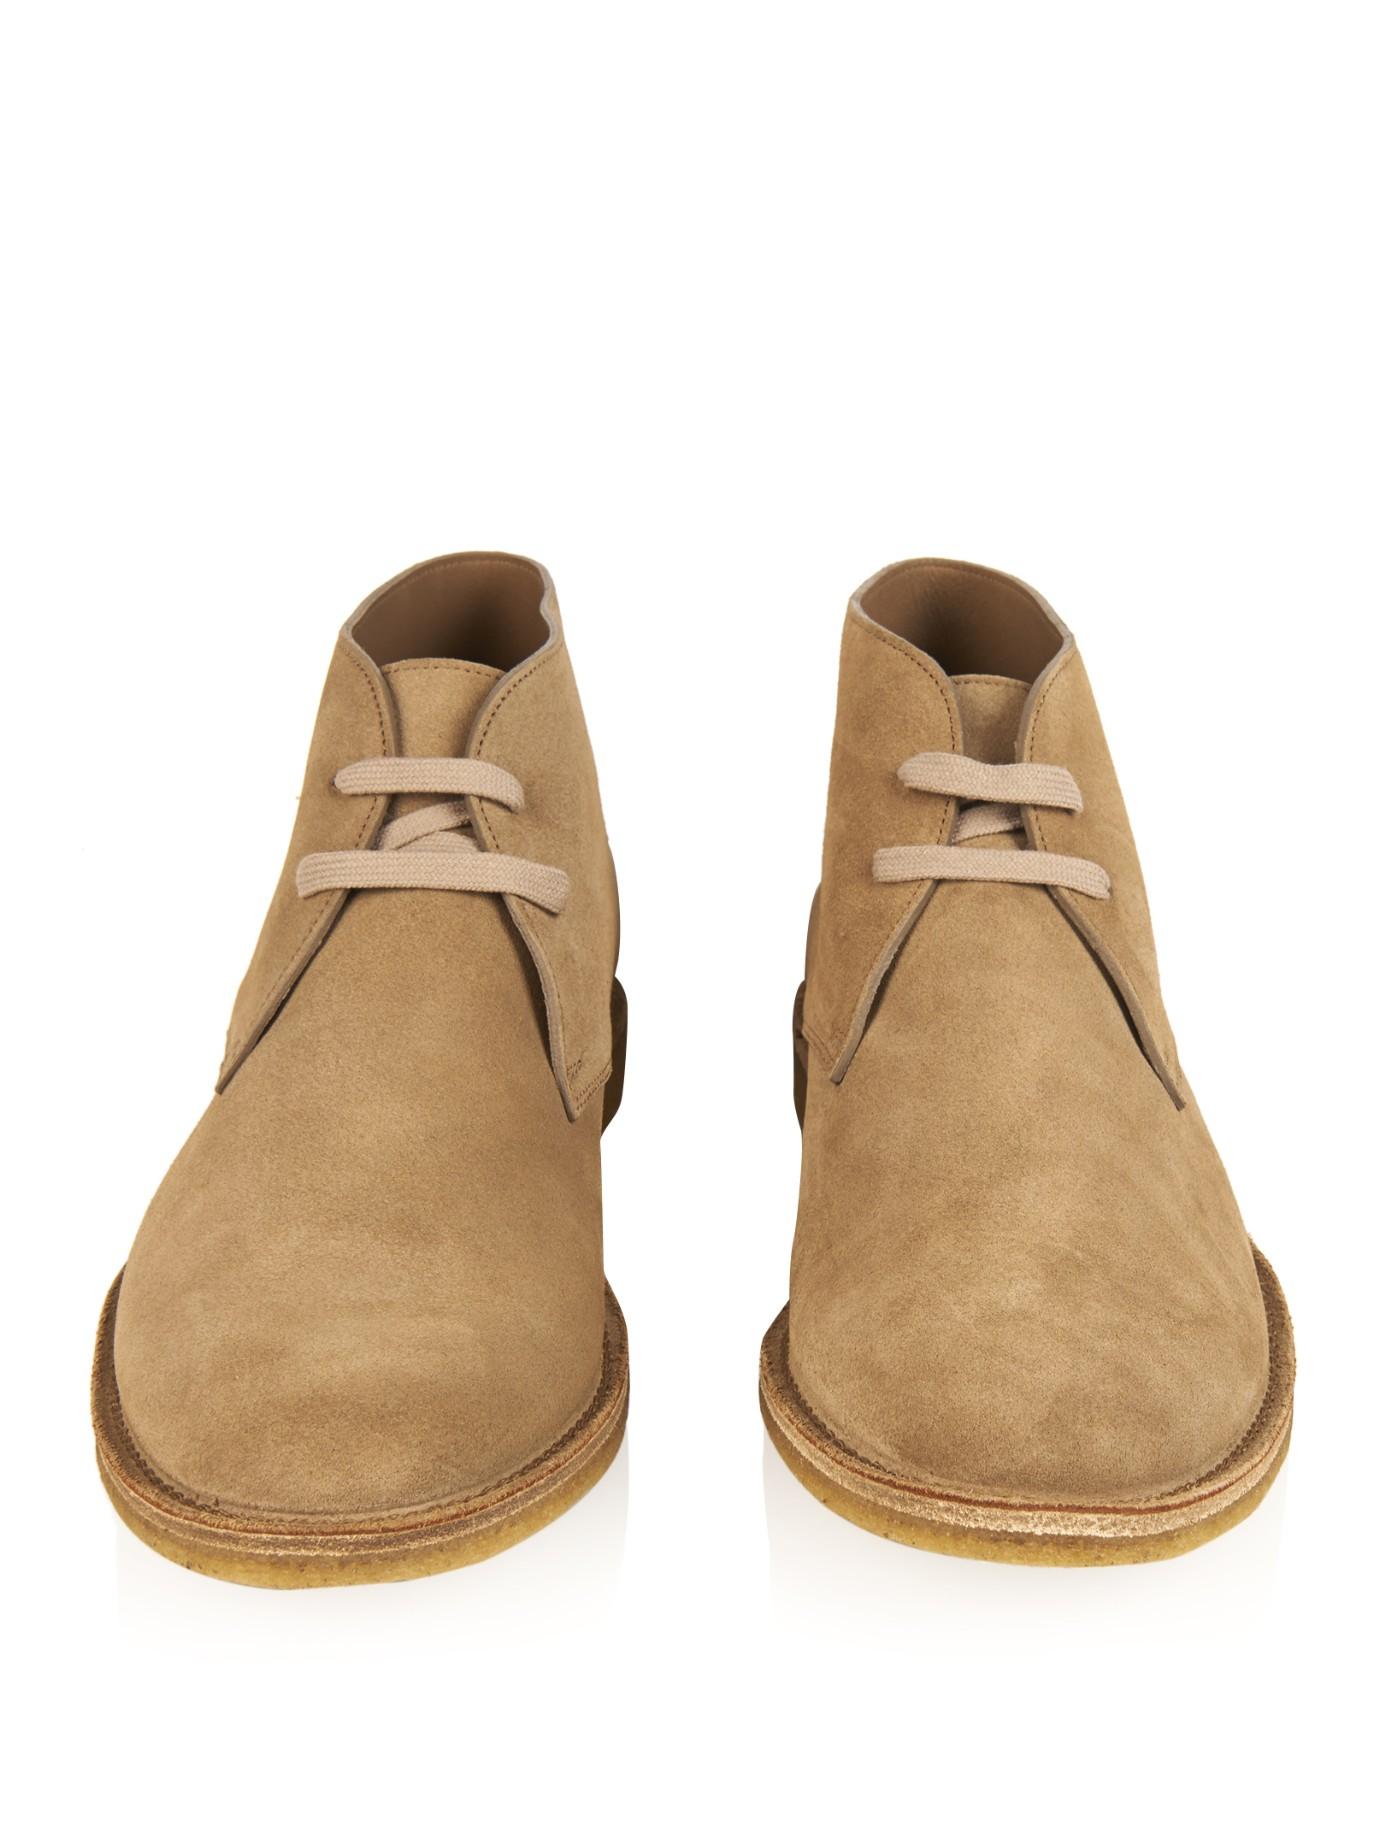 Bottega veneta Suede Desert Boots in Natural for Men | Lyst